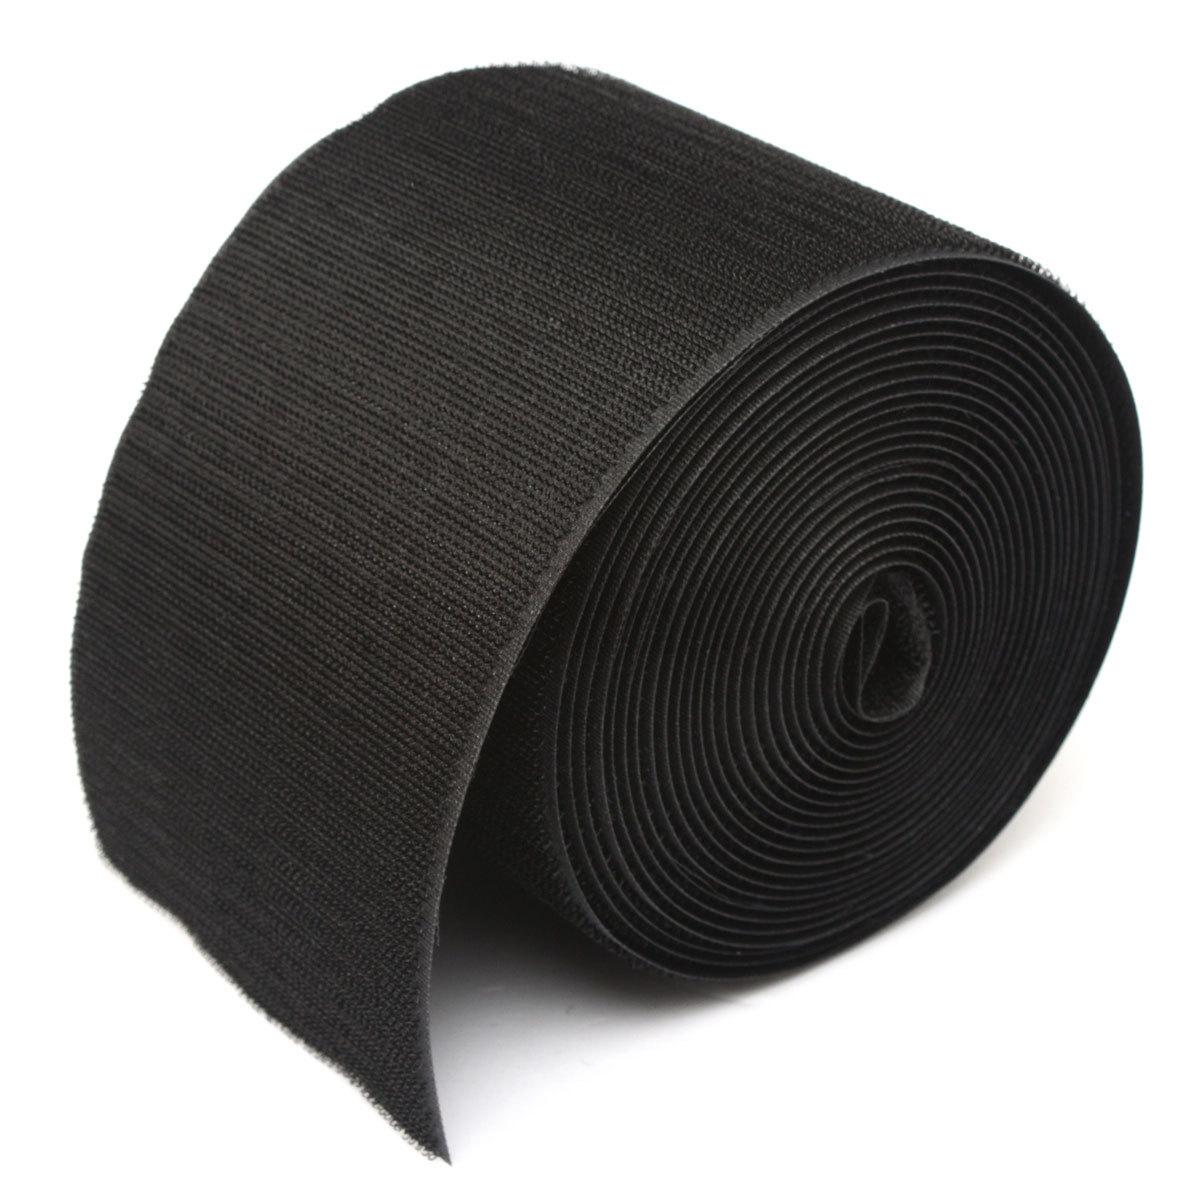 4 cable management organizer floor carpet nylon cover 5m wire sleeve pr. Black Bedroom Furniture Sets. Home Design Ideas